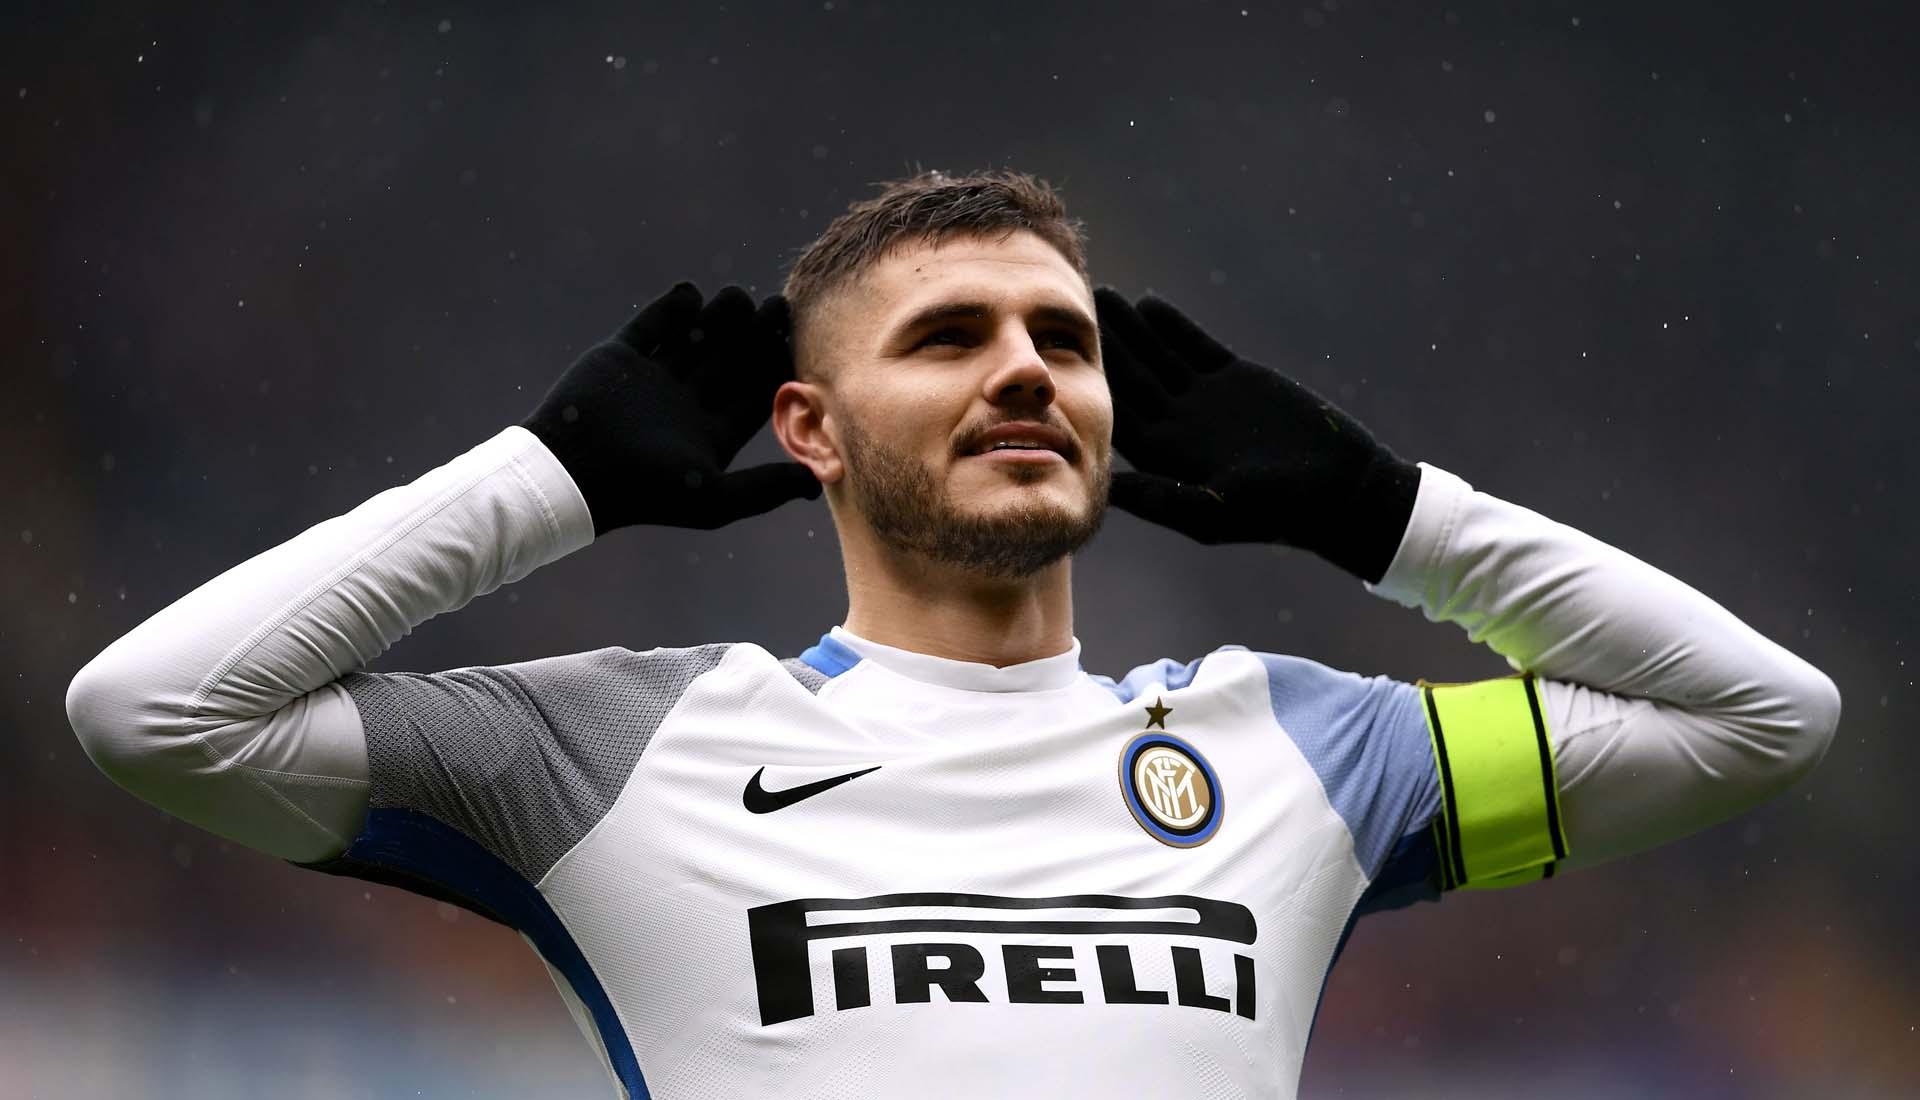 Mauro Icardi Marks 100th Serie A Goal With Bespoke Hypervenom ... 7147b2a28